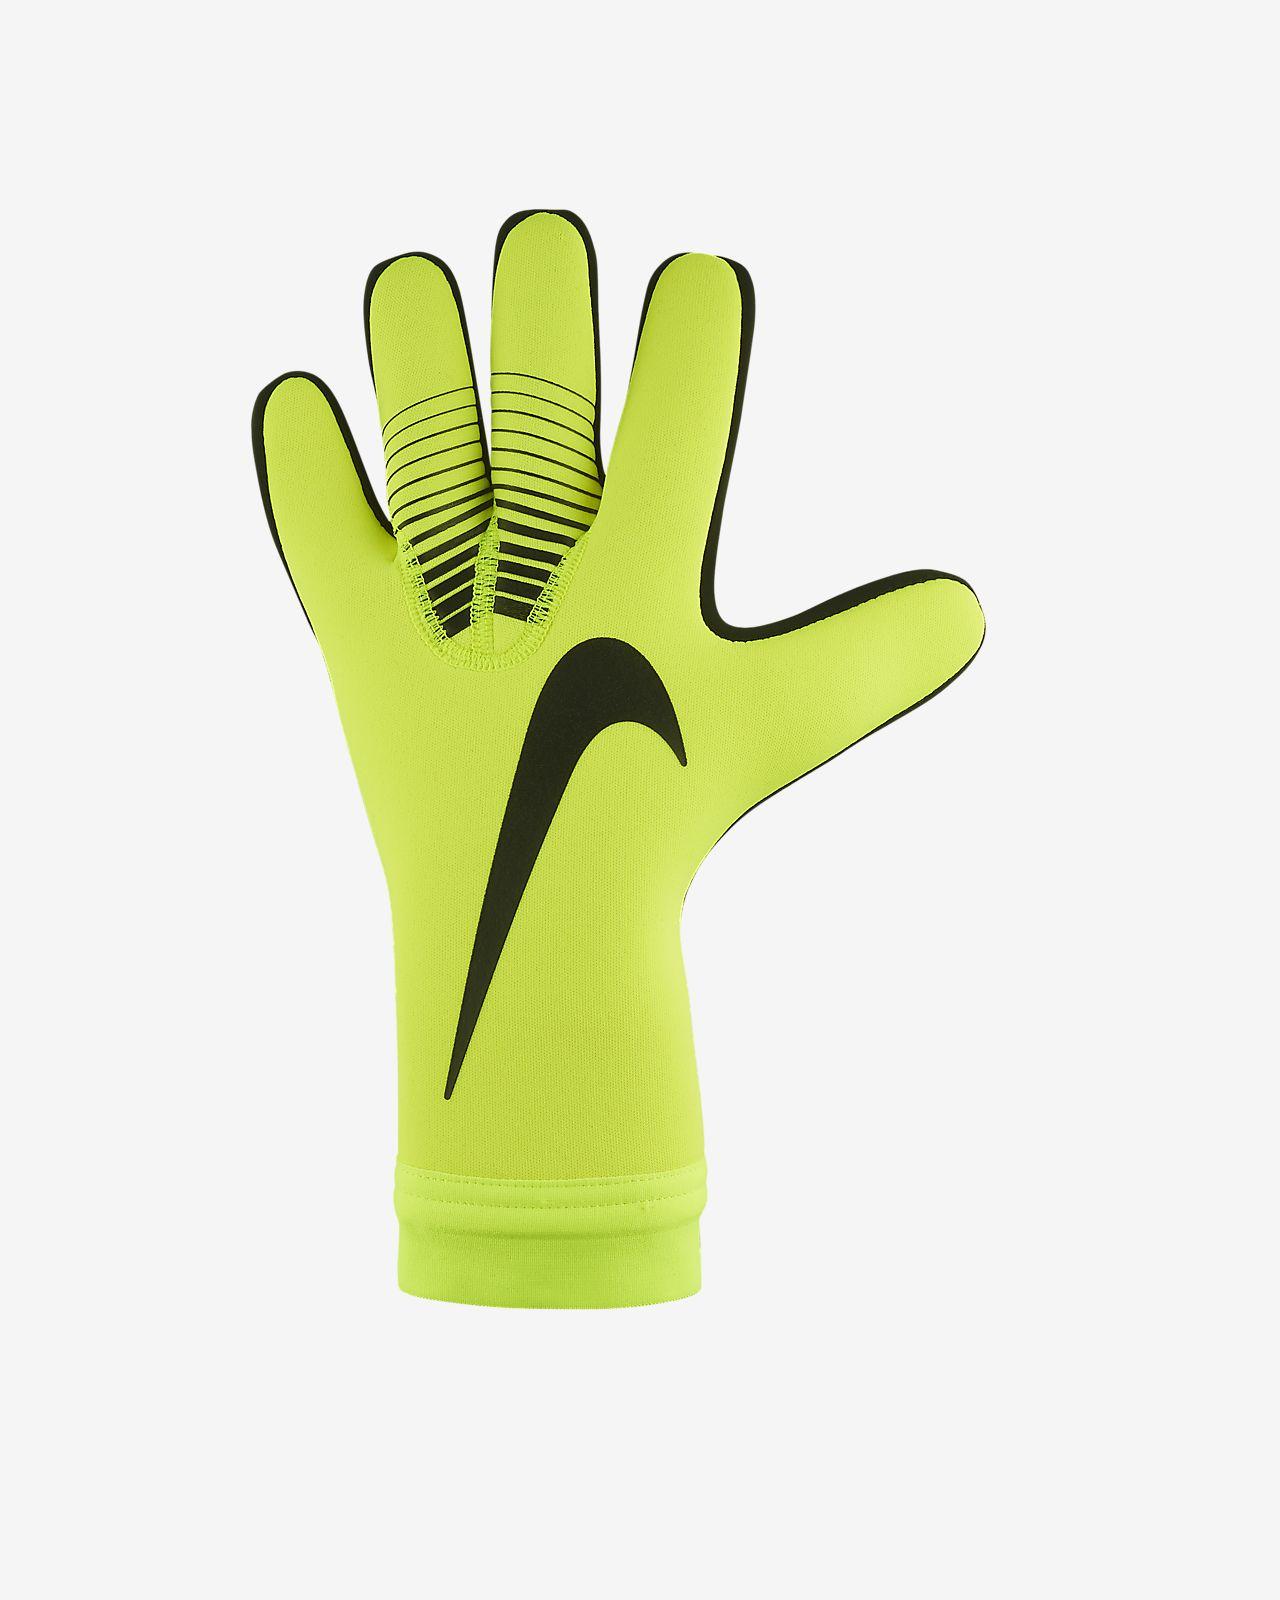 65bf9cee3 Guantes de fútbol Nike Mercurial Goalkeeper Touch Victory. Nike.com MX